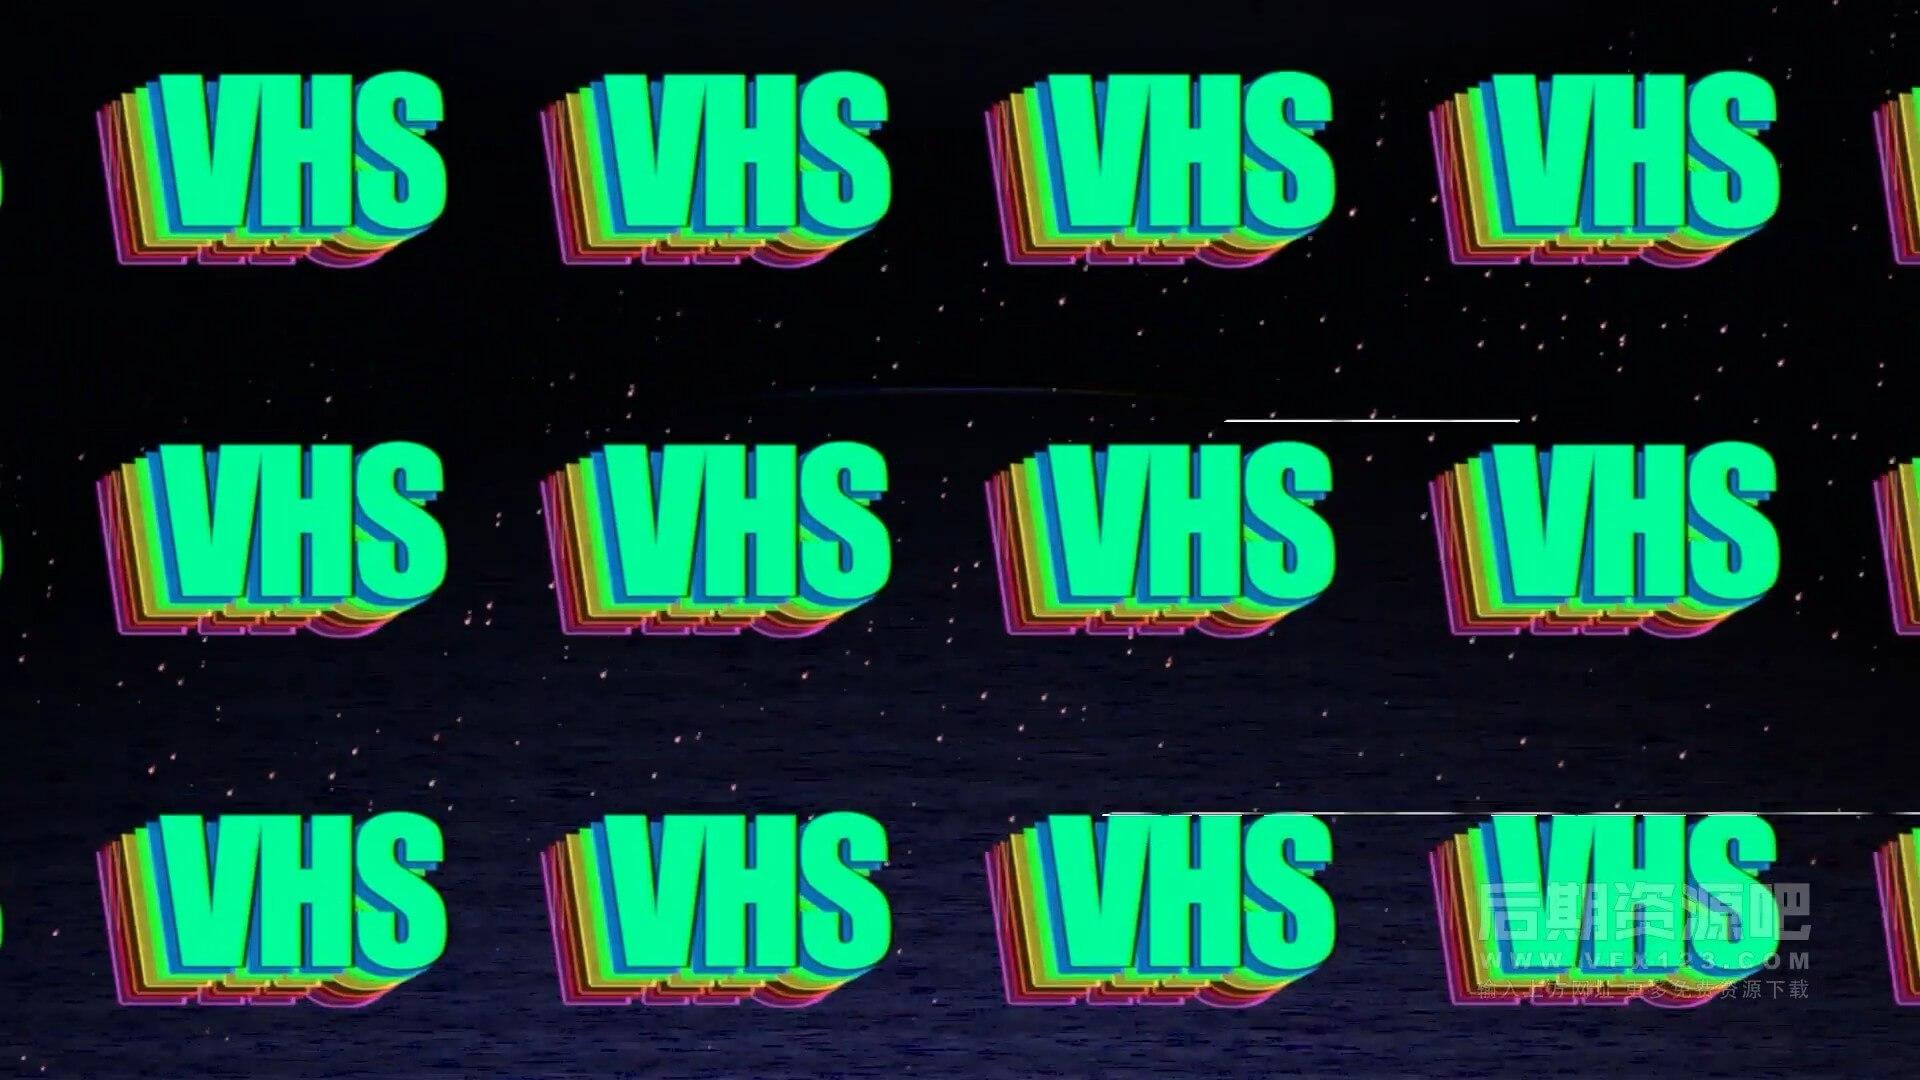 Fcpx插件 复古风格旧电影色彩分离特效+转场+标题+片头模板 VHS Pack 2.0